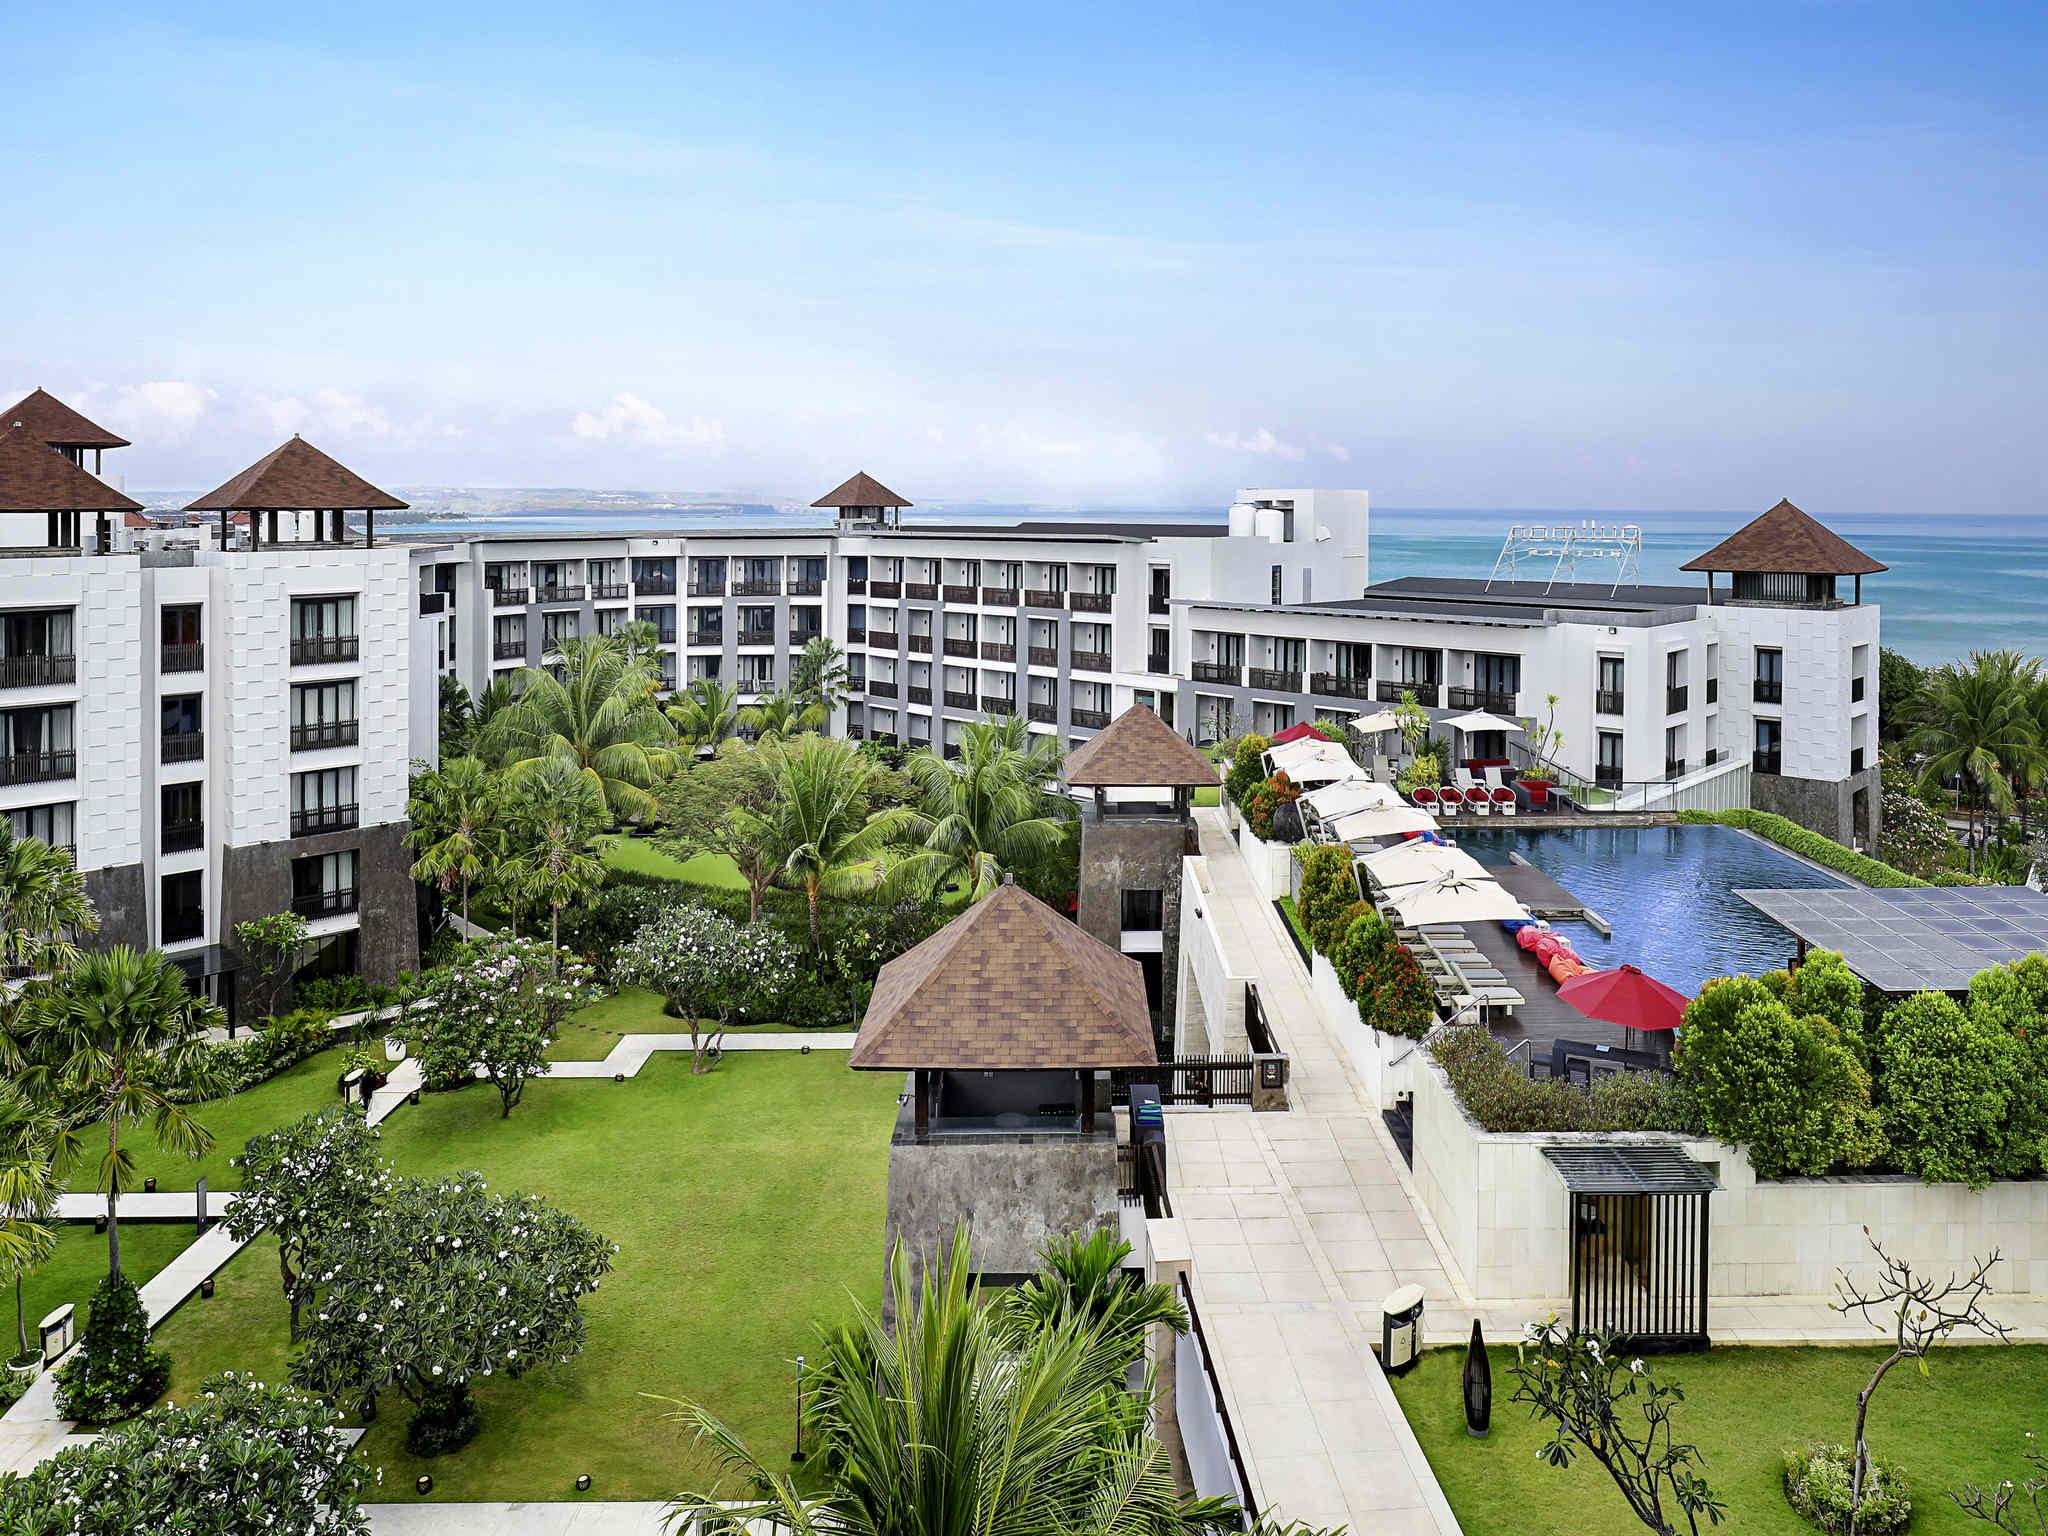 Pullman Bali Legian Beach Business Leisure Accorhotels Voucher Resort Four Seasons Resorts At Sayan Hotel